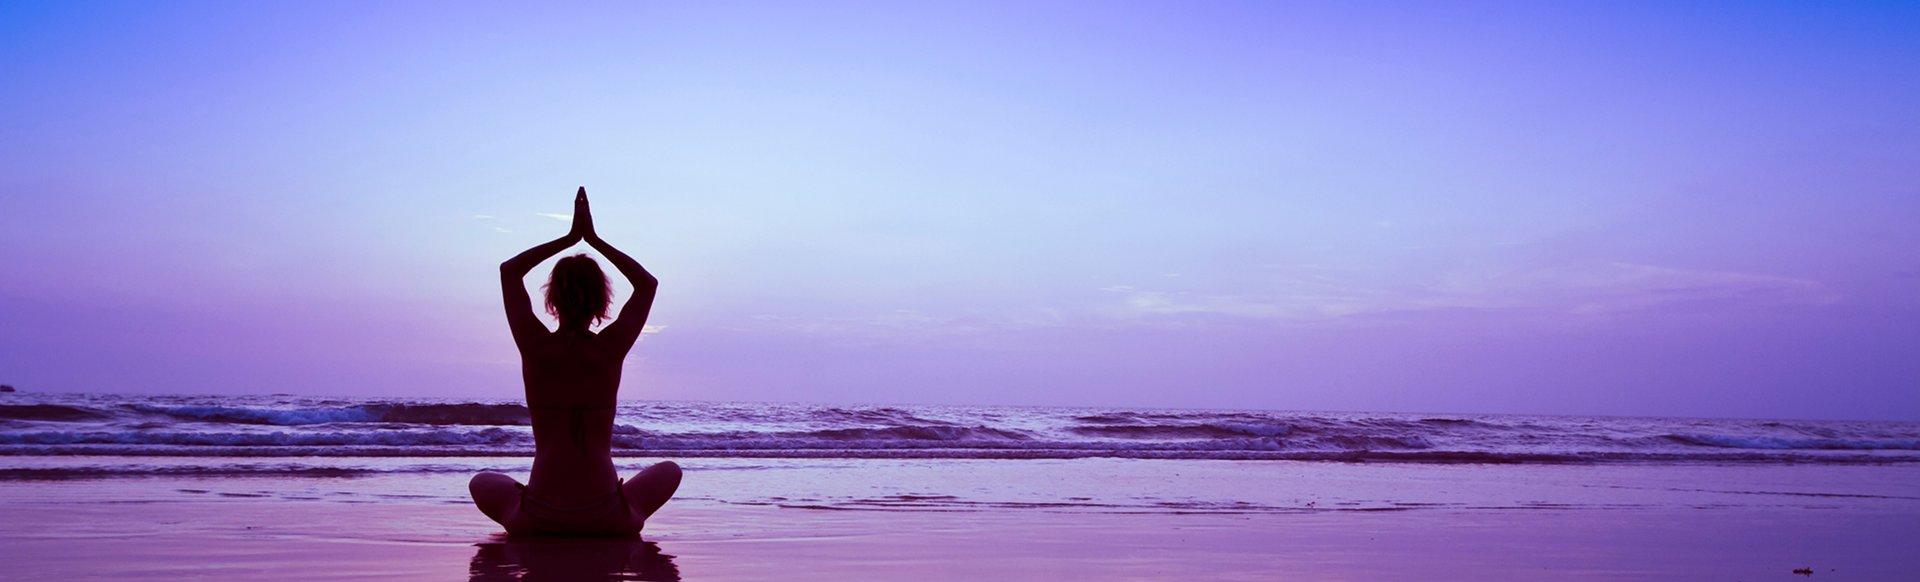 Radiesthésie-Rebirth-Qi Gong-Méditation-Milta-thérapie